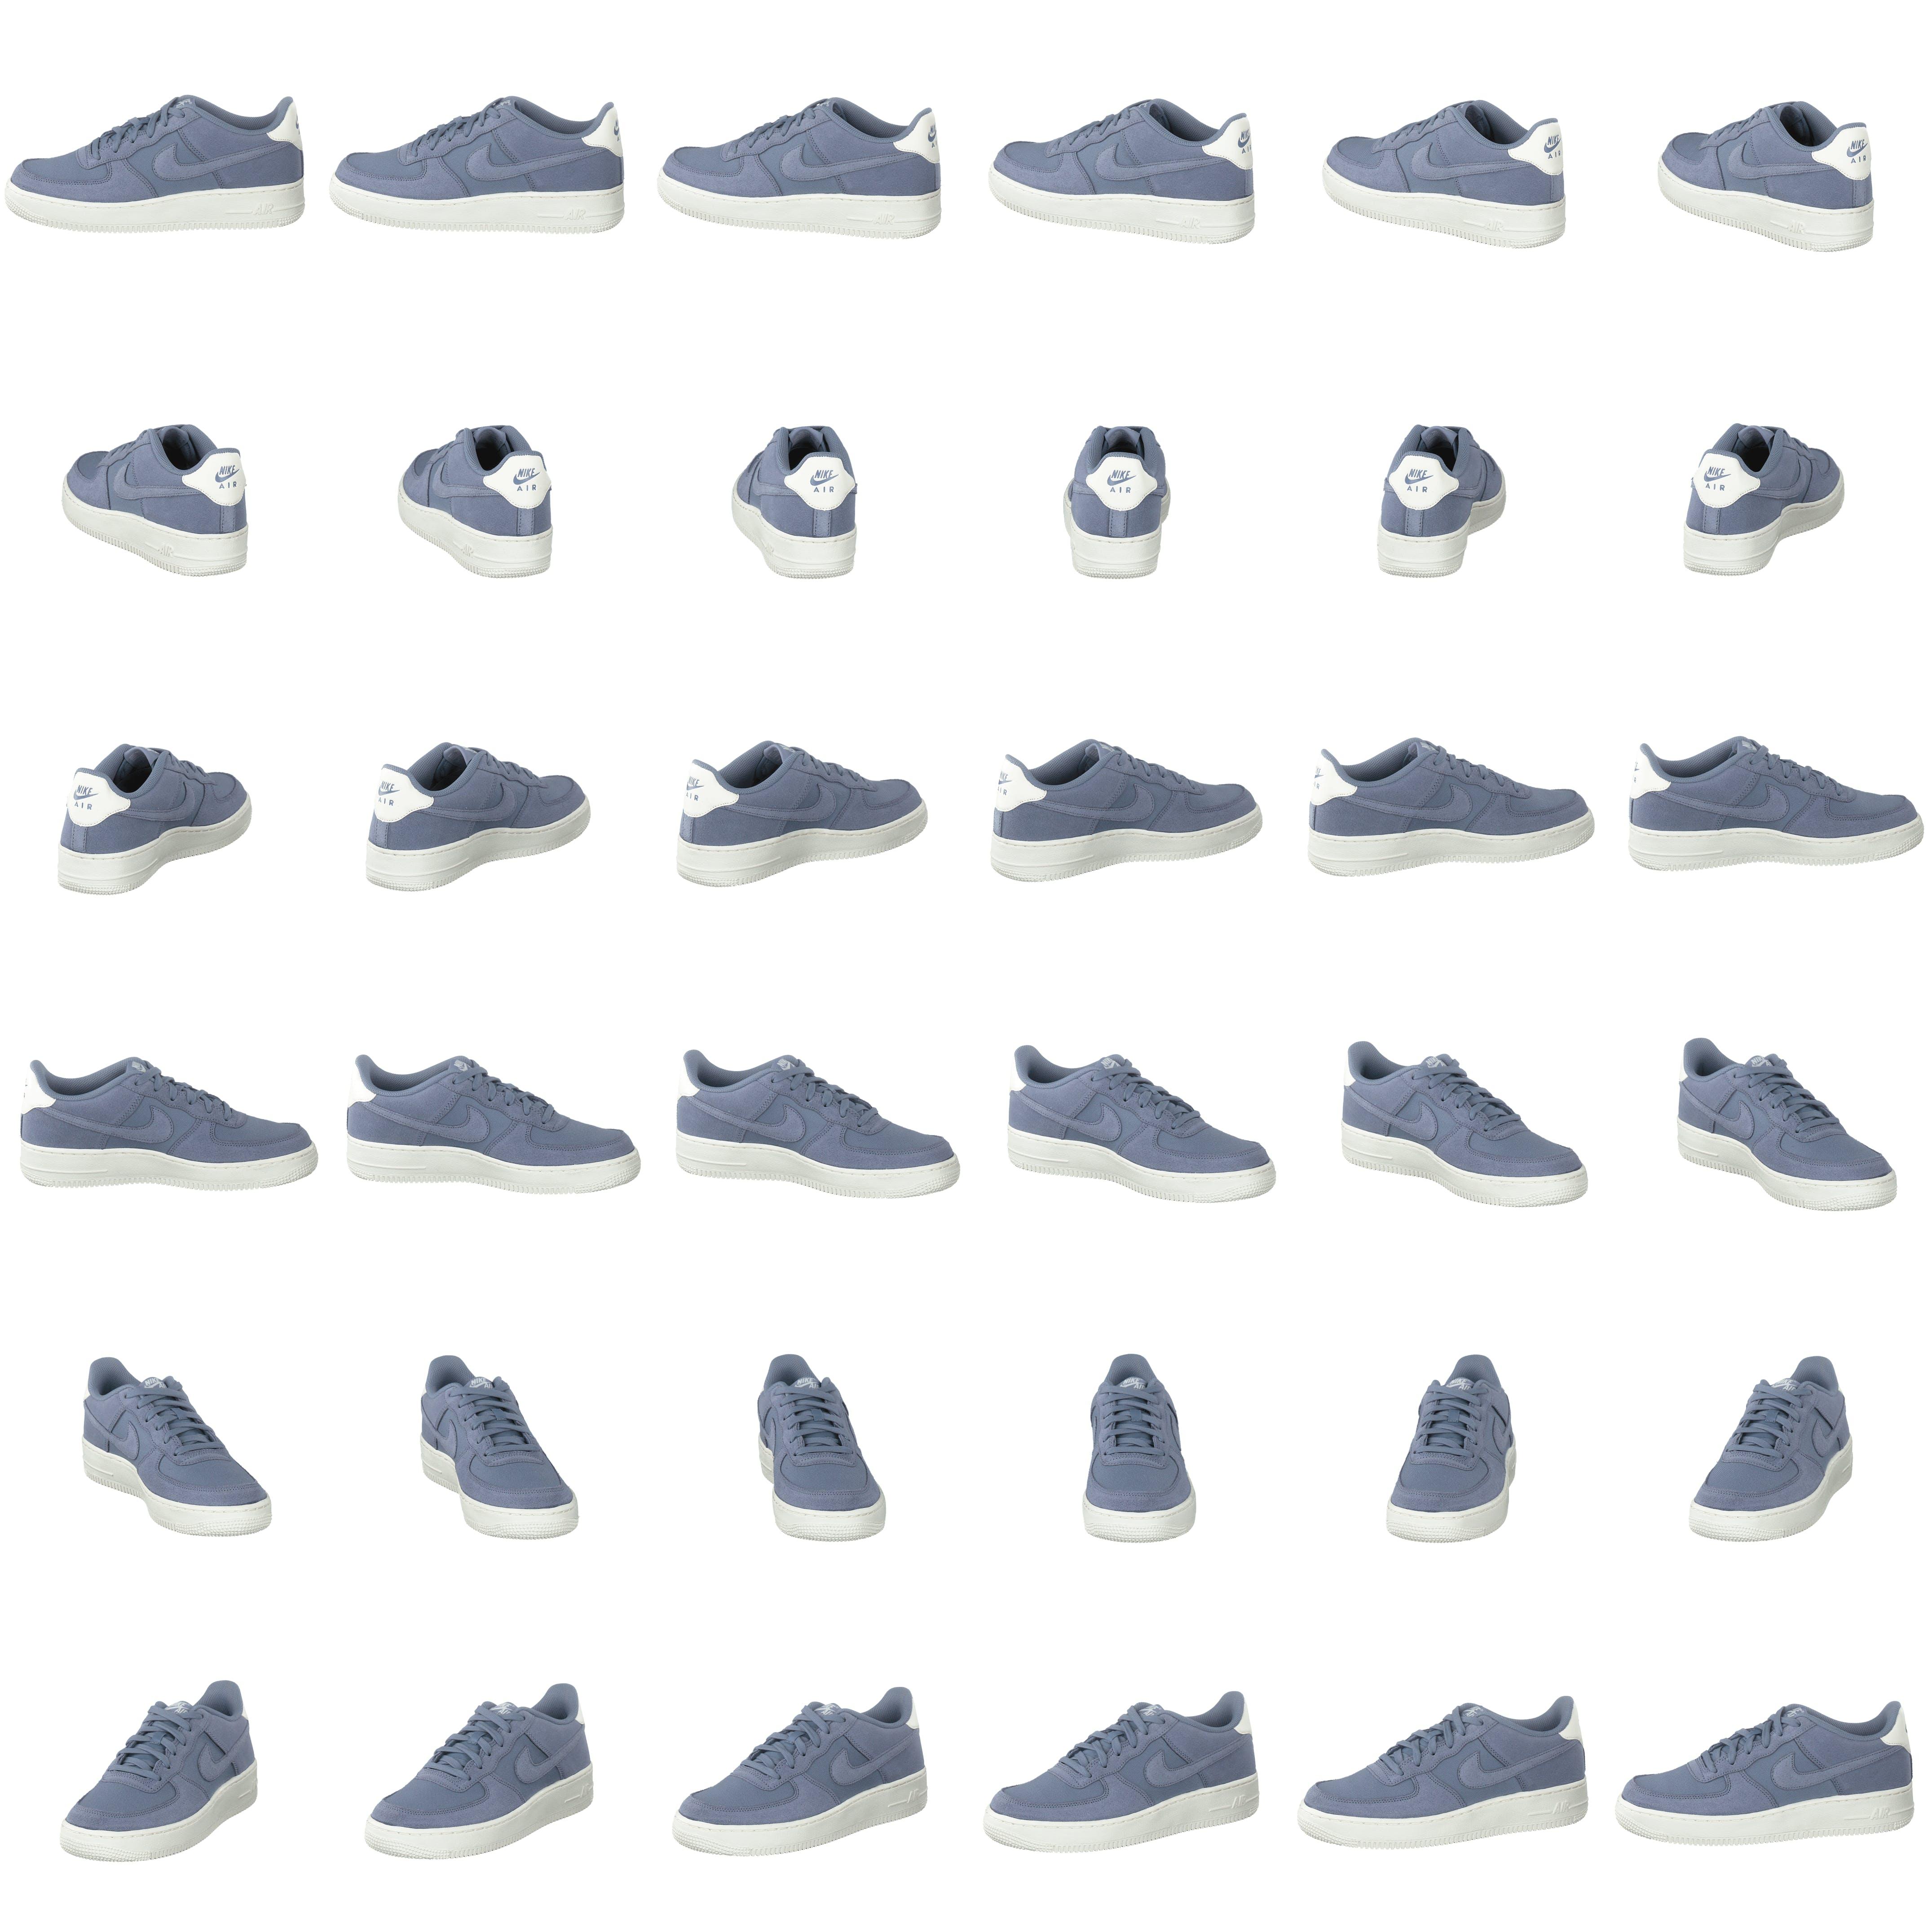 Nike Air Force 1 Suede Bg Ashen Slateashen Slate sail